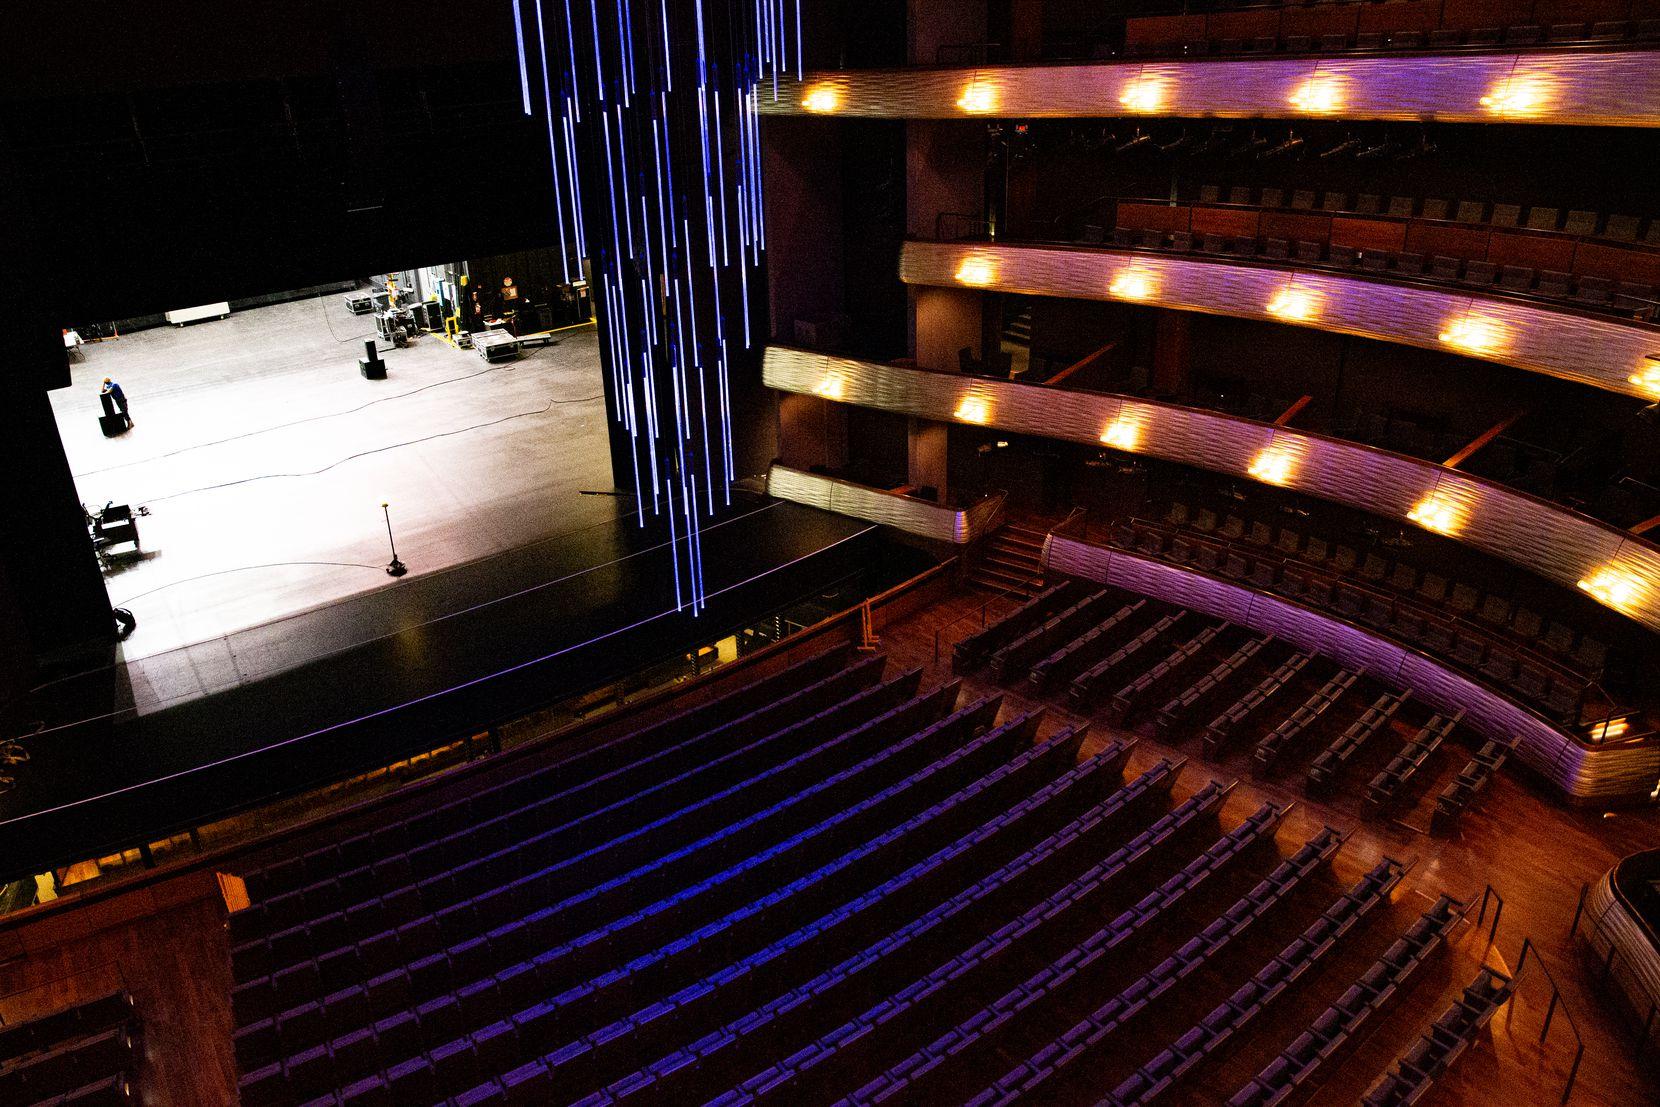 The empty Winspear Opera House photographed in Dallas on Feb. 4, 2021. (Juan Figueroa/ The Dallas Morning News)